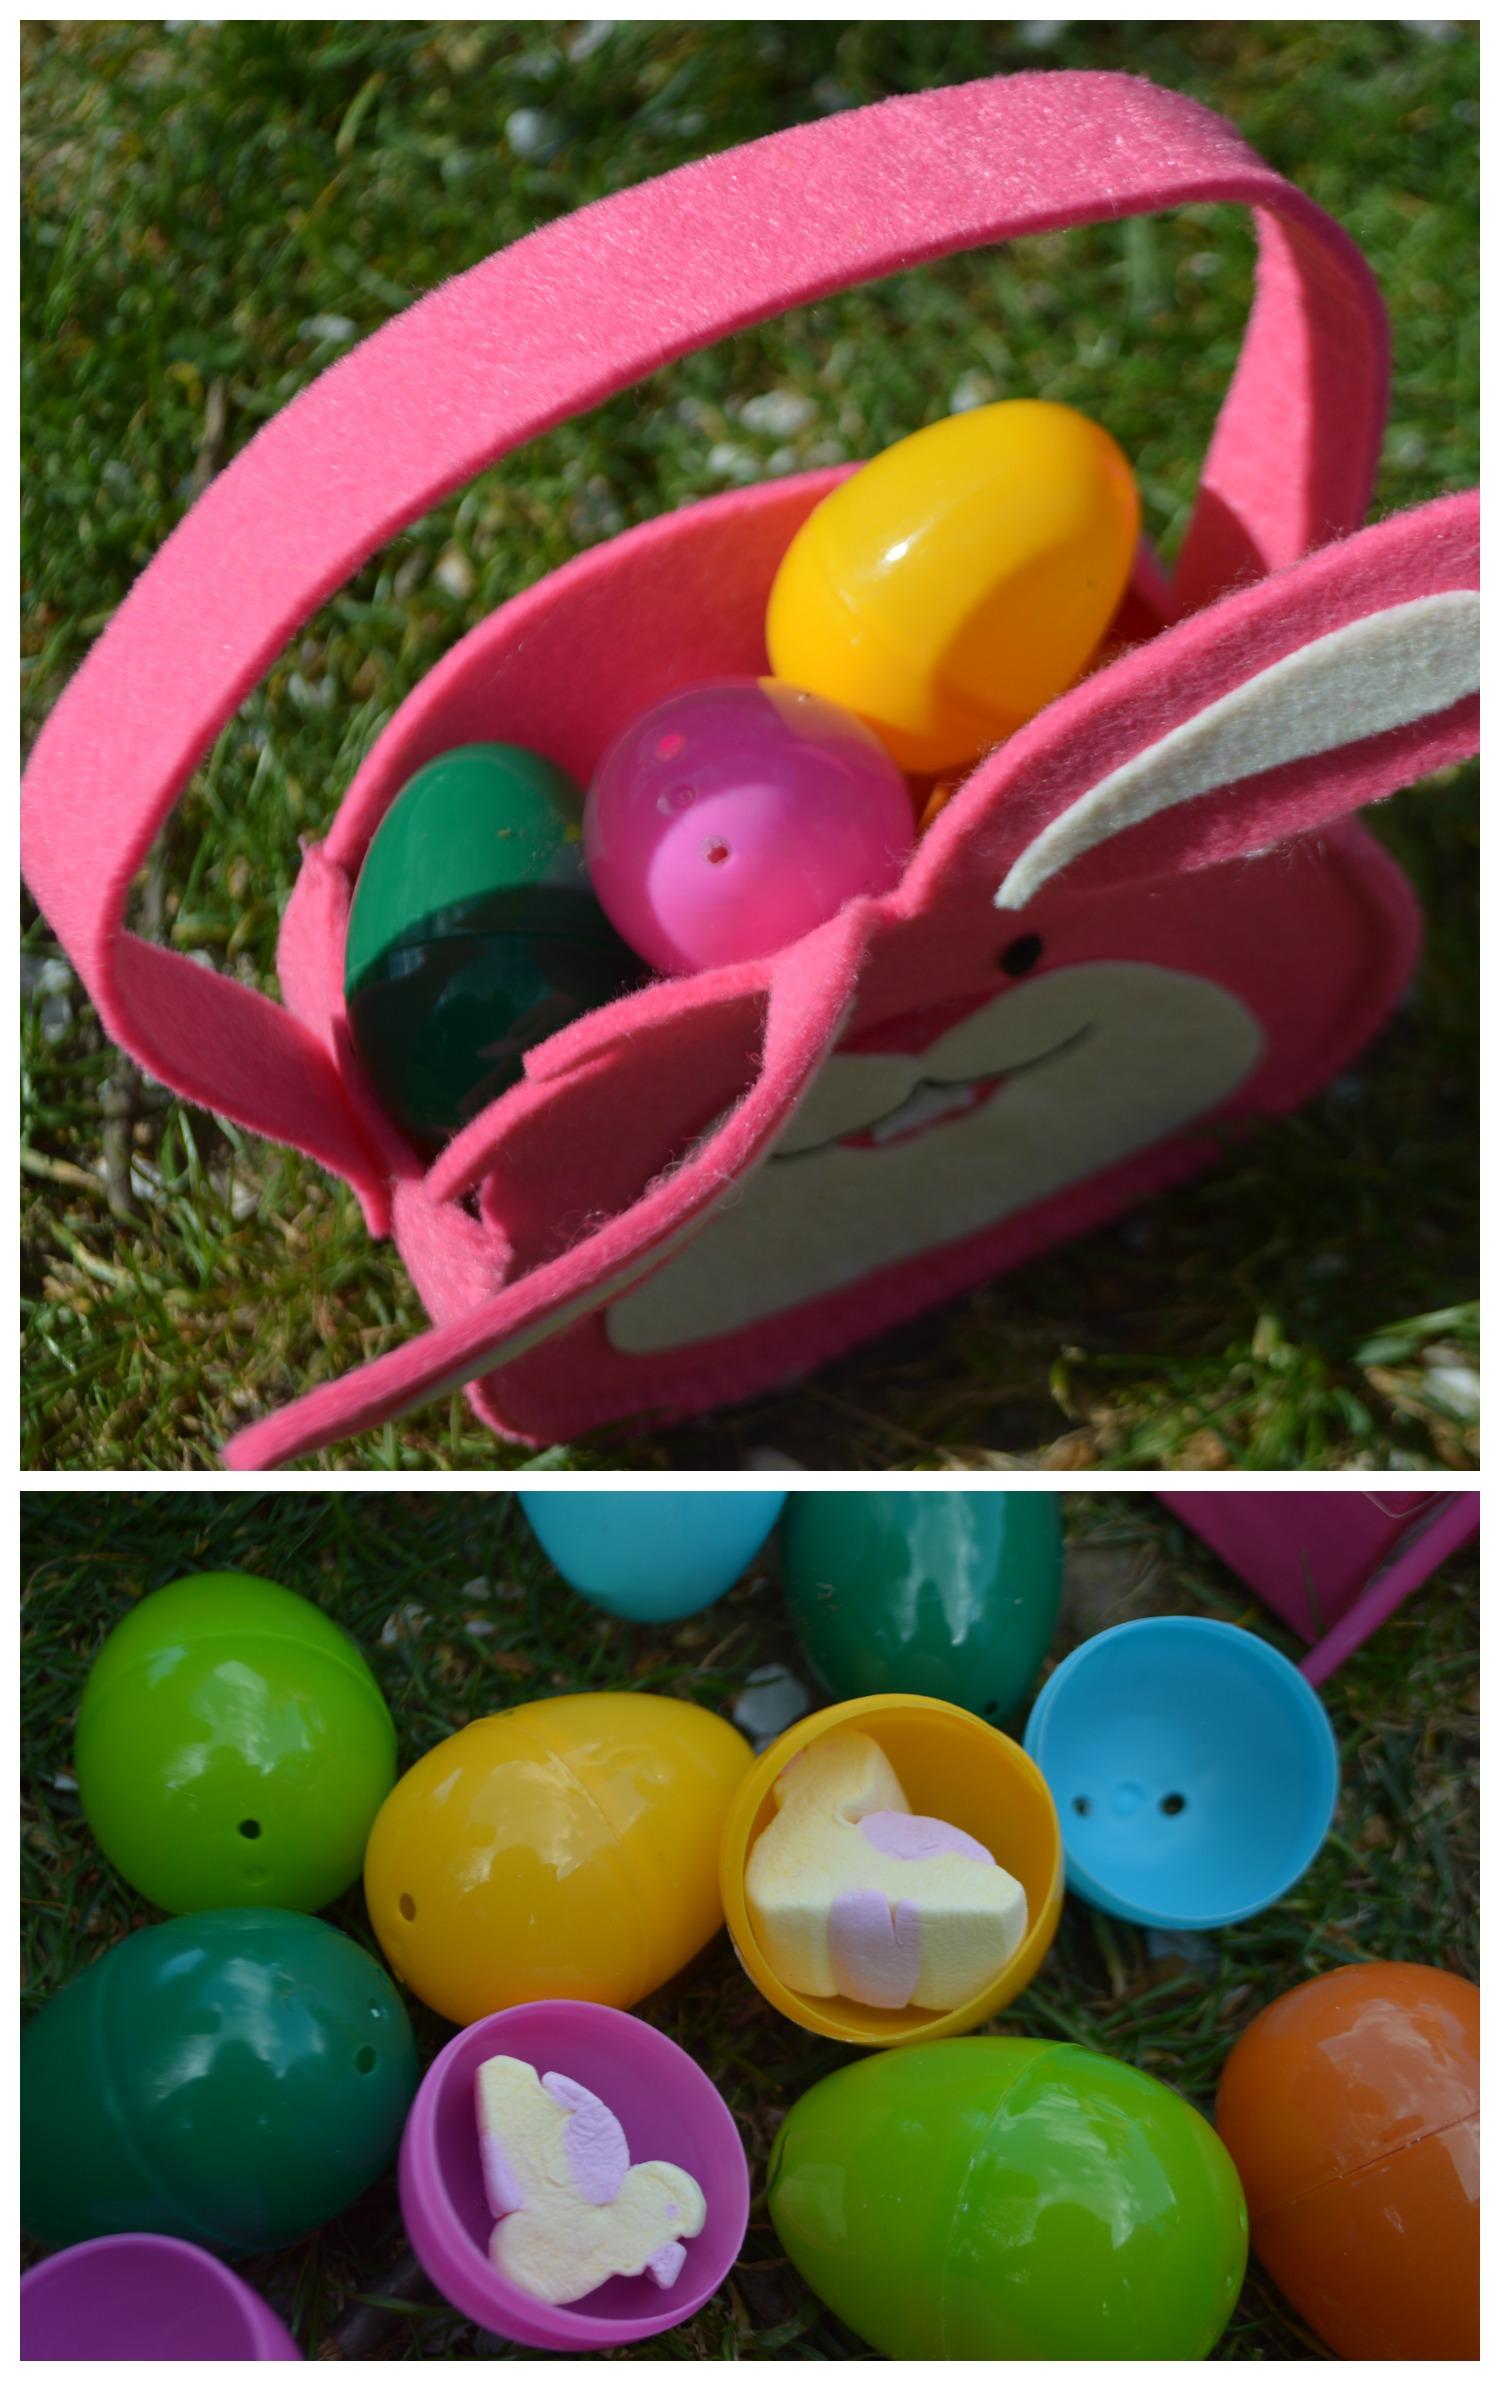 Easter eggs deals asda 2018 subaru forester deals ferrero rocher offers asda boxwind negle Images